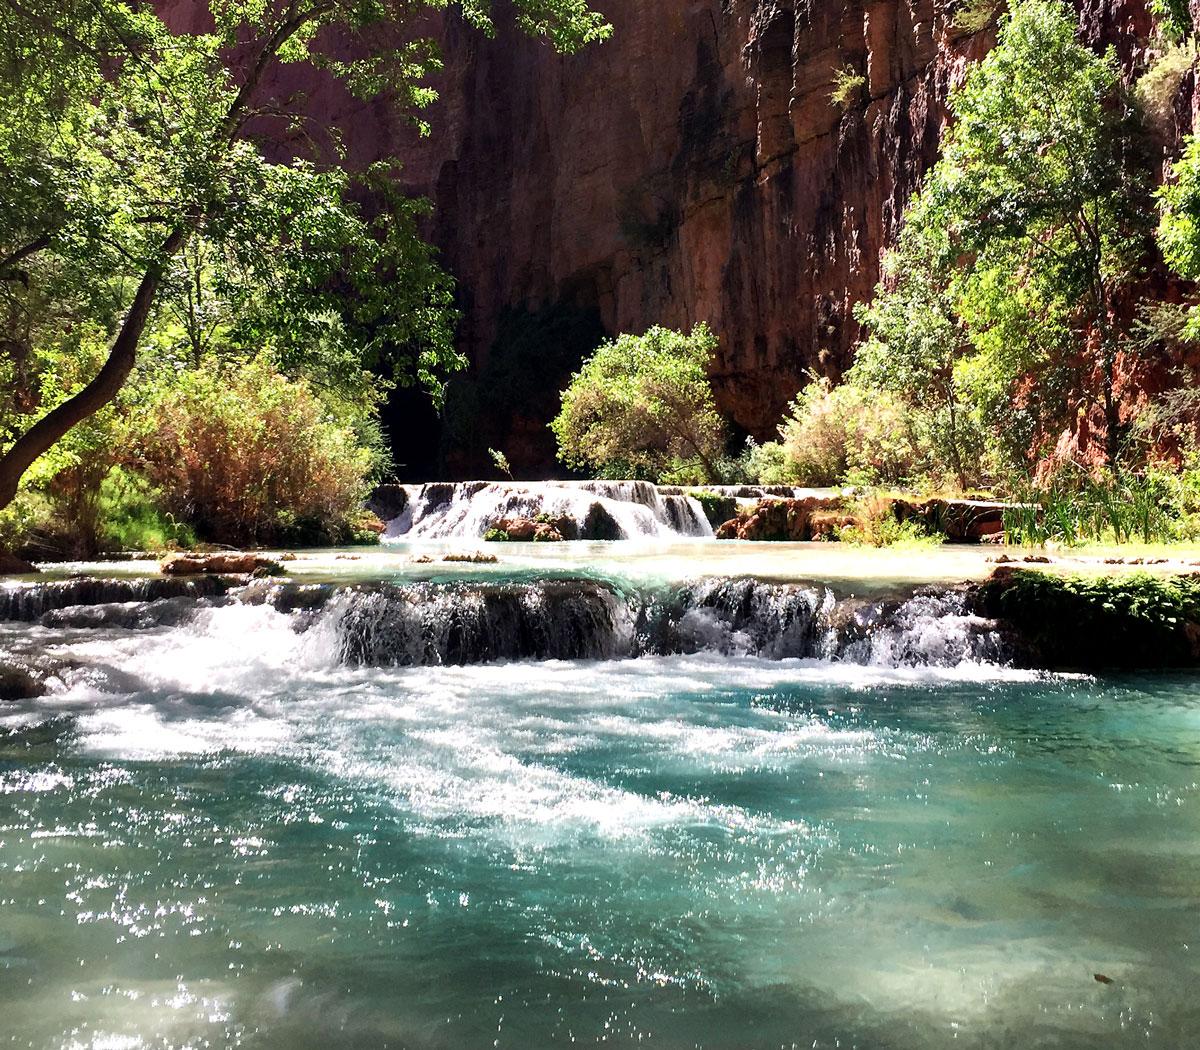 Havasu-Falls-Mooney-Falls-Beaver-Falls-Hike-Stream-Arizona-By-Bumble-and-Bustle